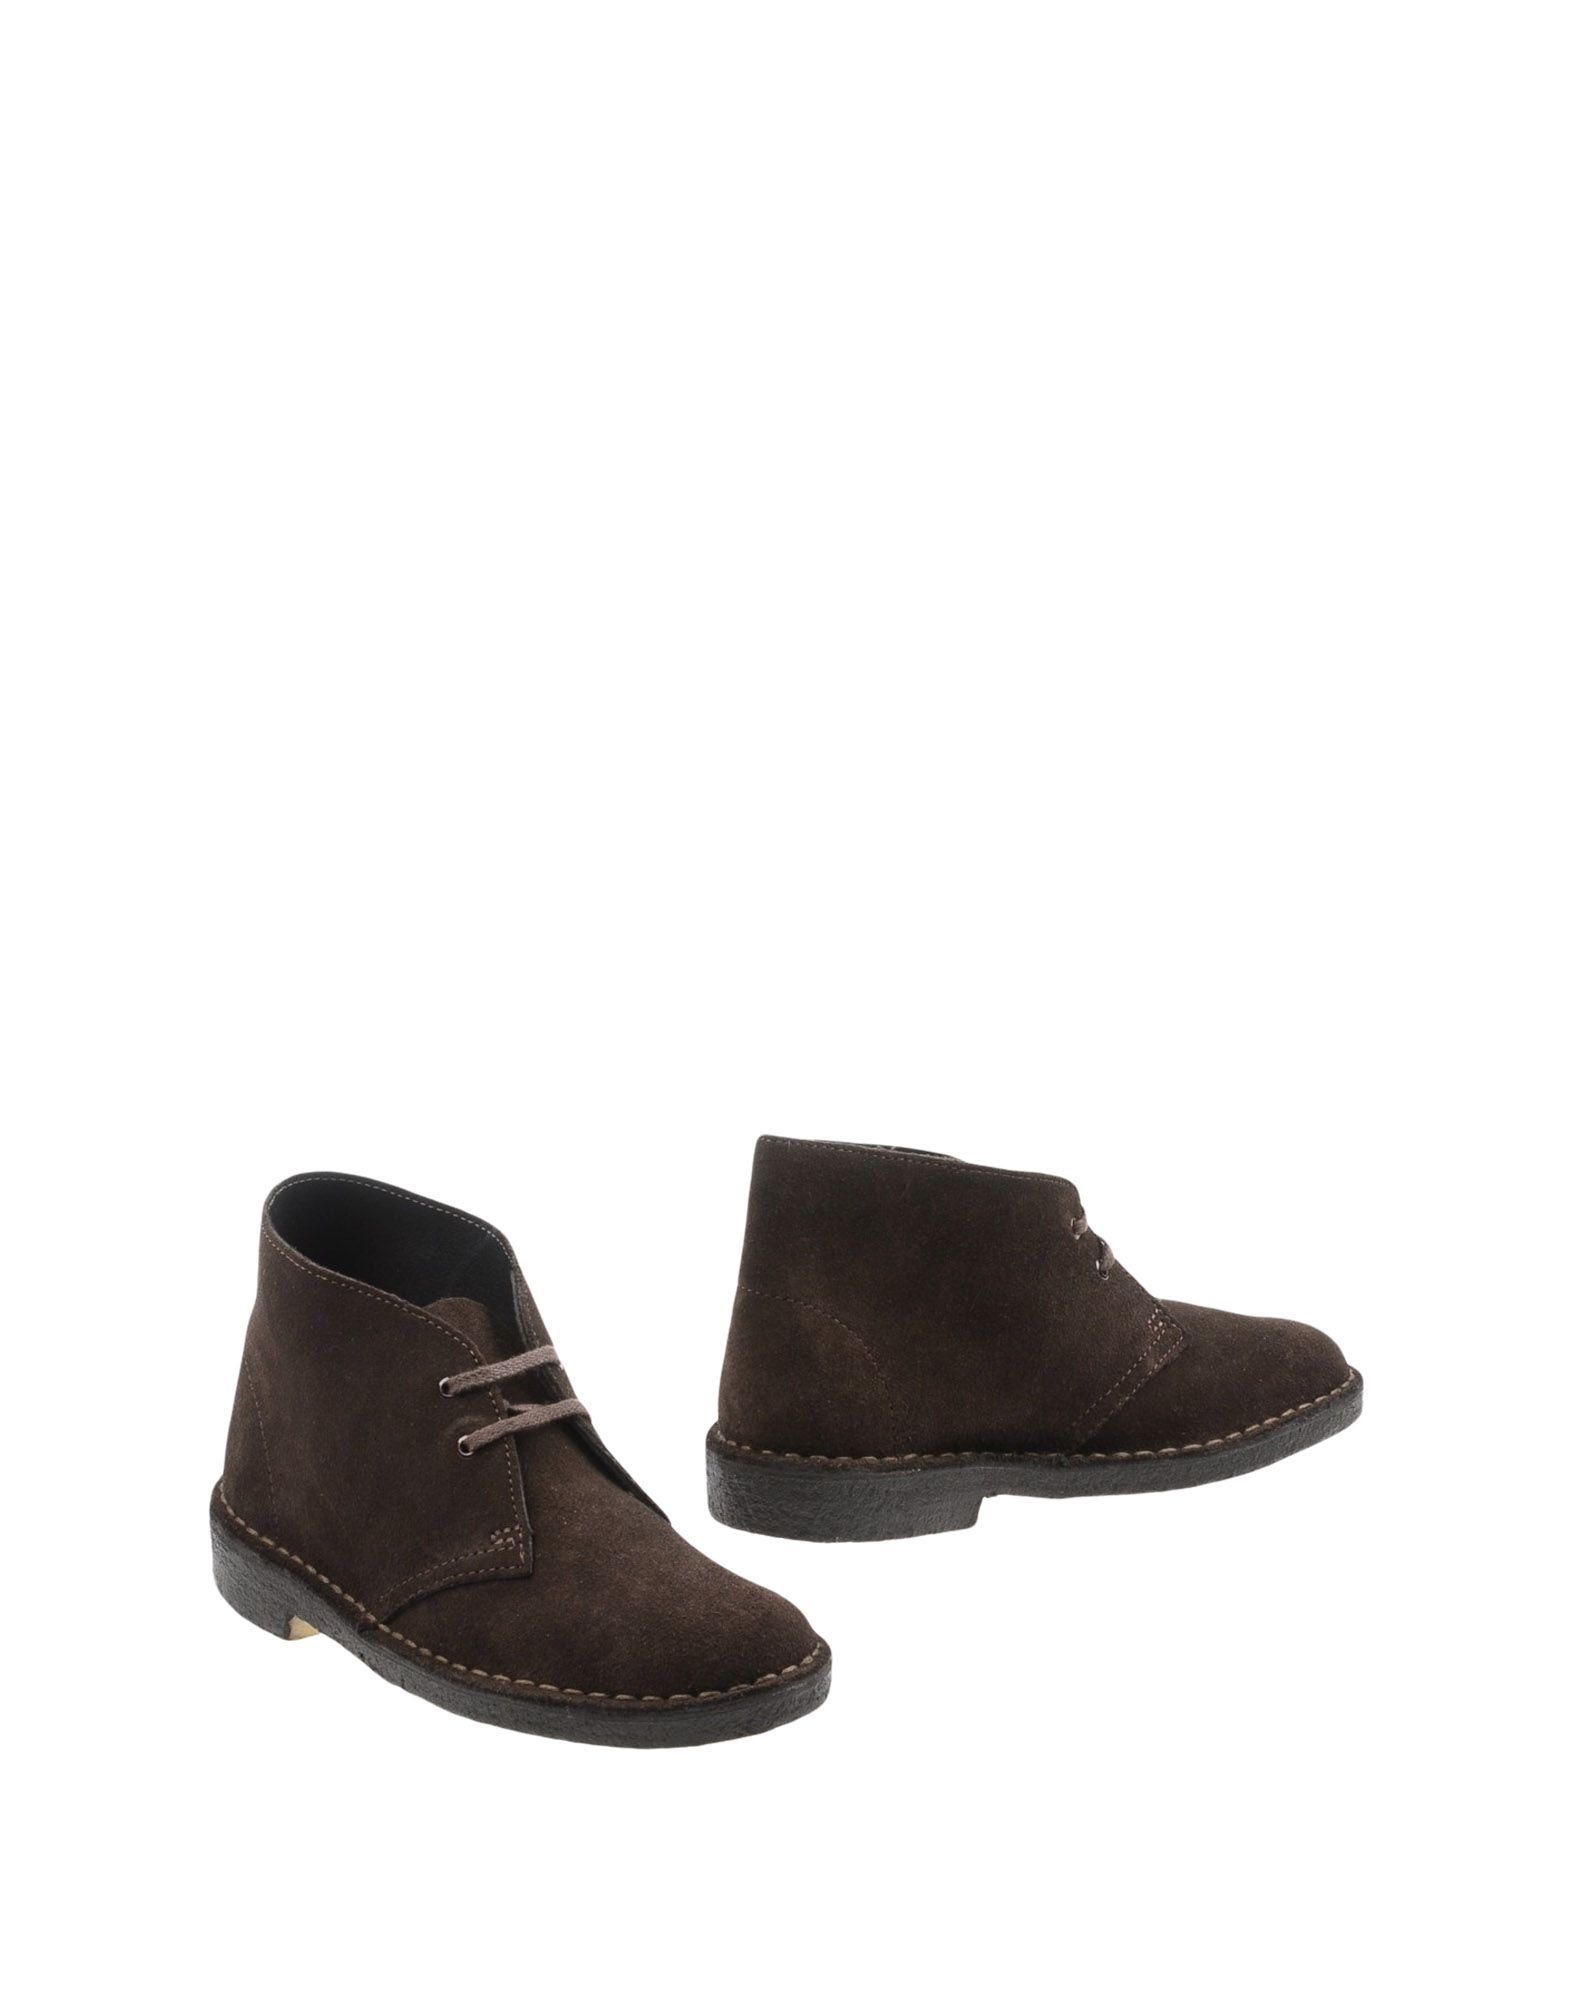 Clarks Originals Women's Ankle Boots Dark Brown Leather